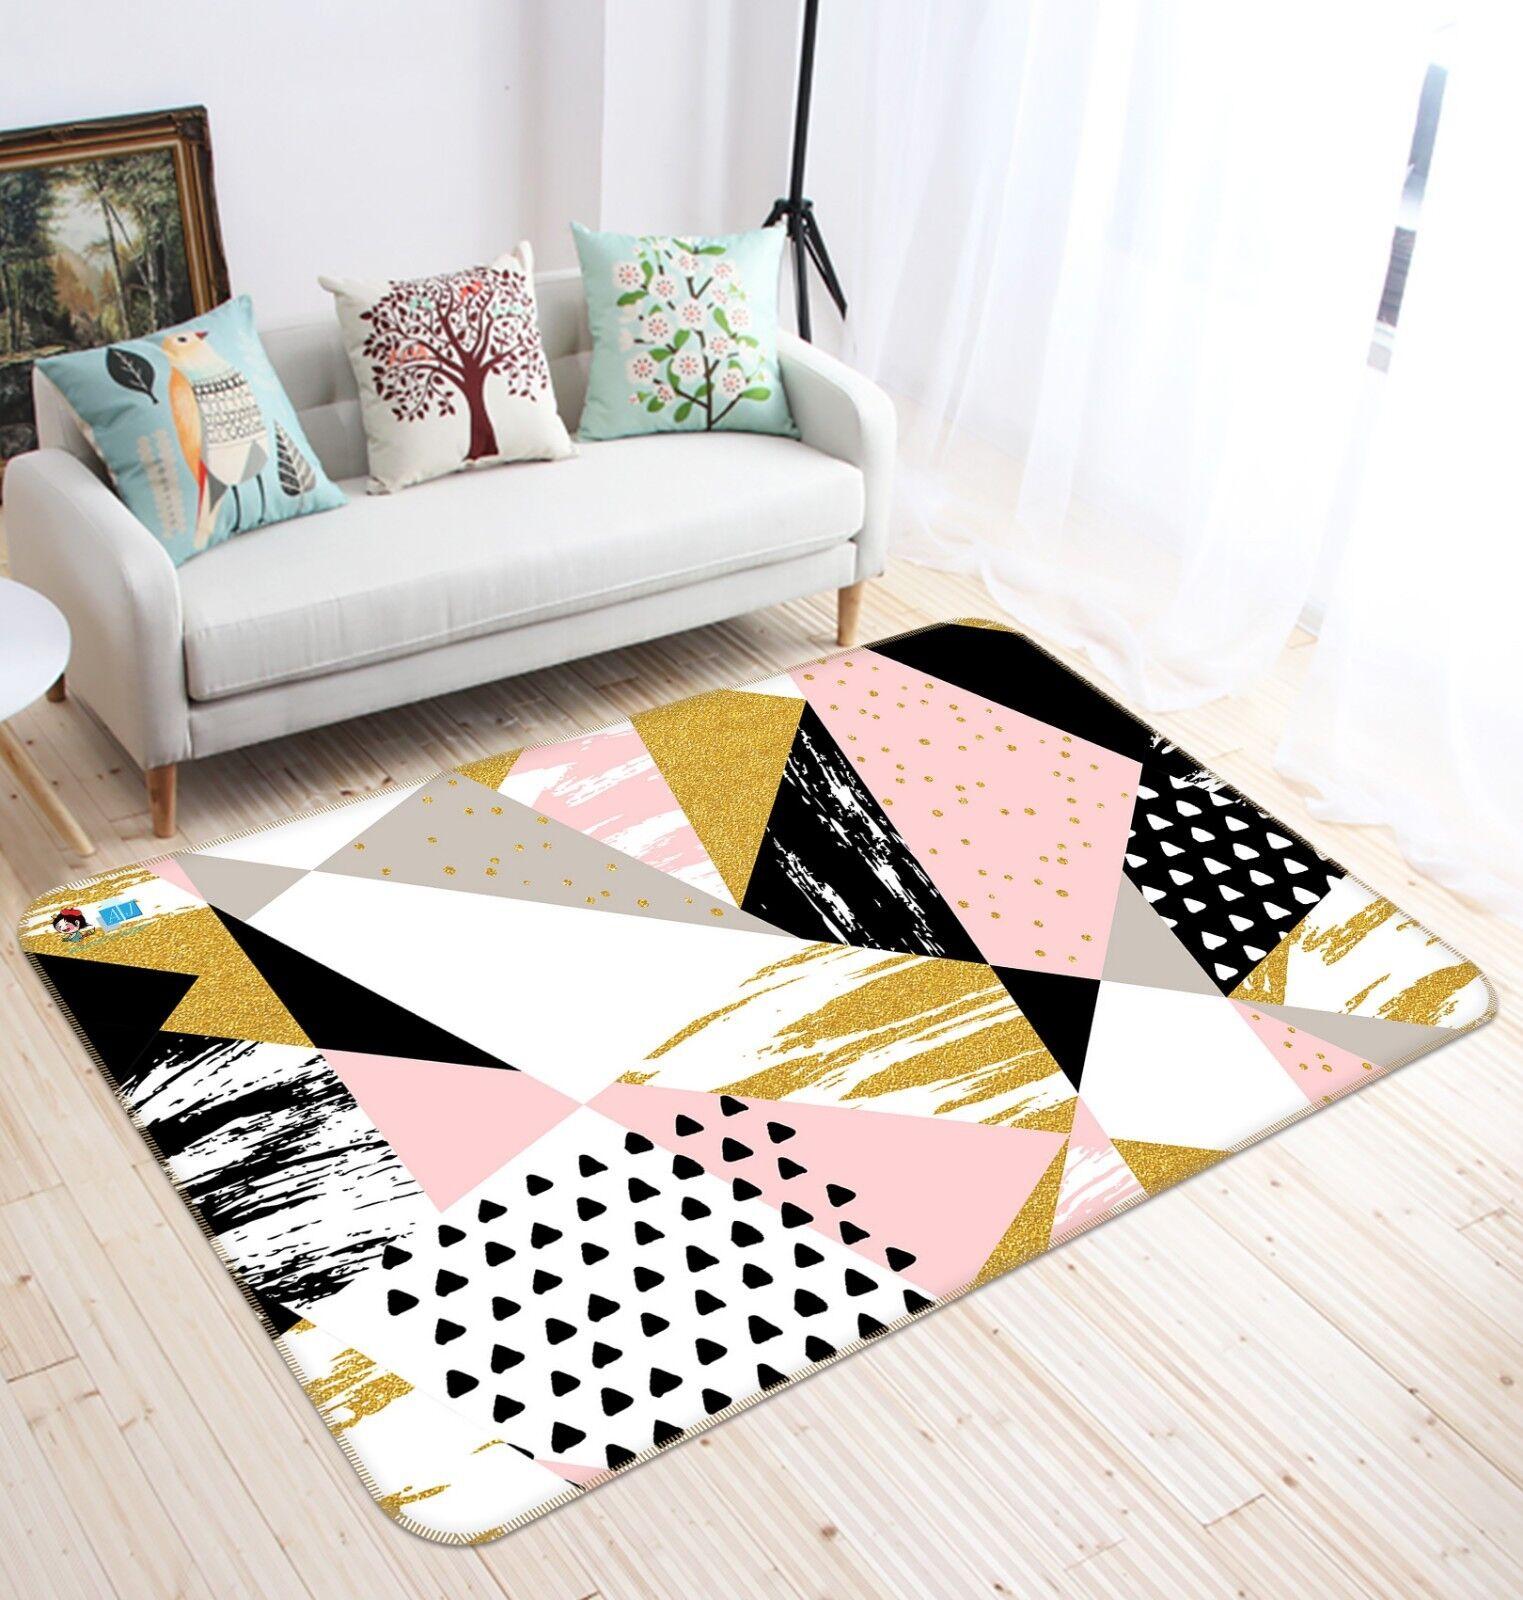 3D Geometry Graffiti 6 6 6 Non Slip Rug Mat Room Mat Quality Elegant Photo Carpet UK 0bf28c